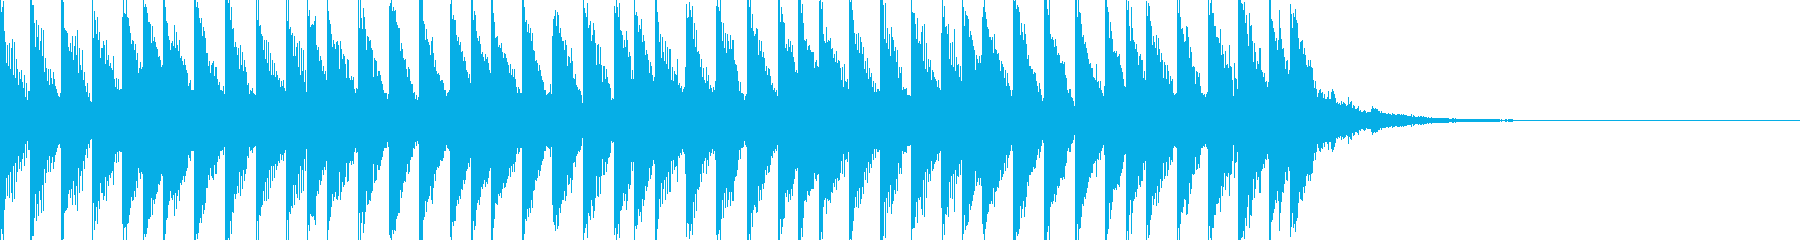 SimpleなSound Logoの再生済みの波形